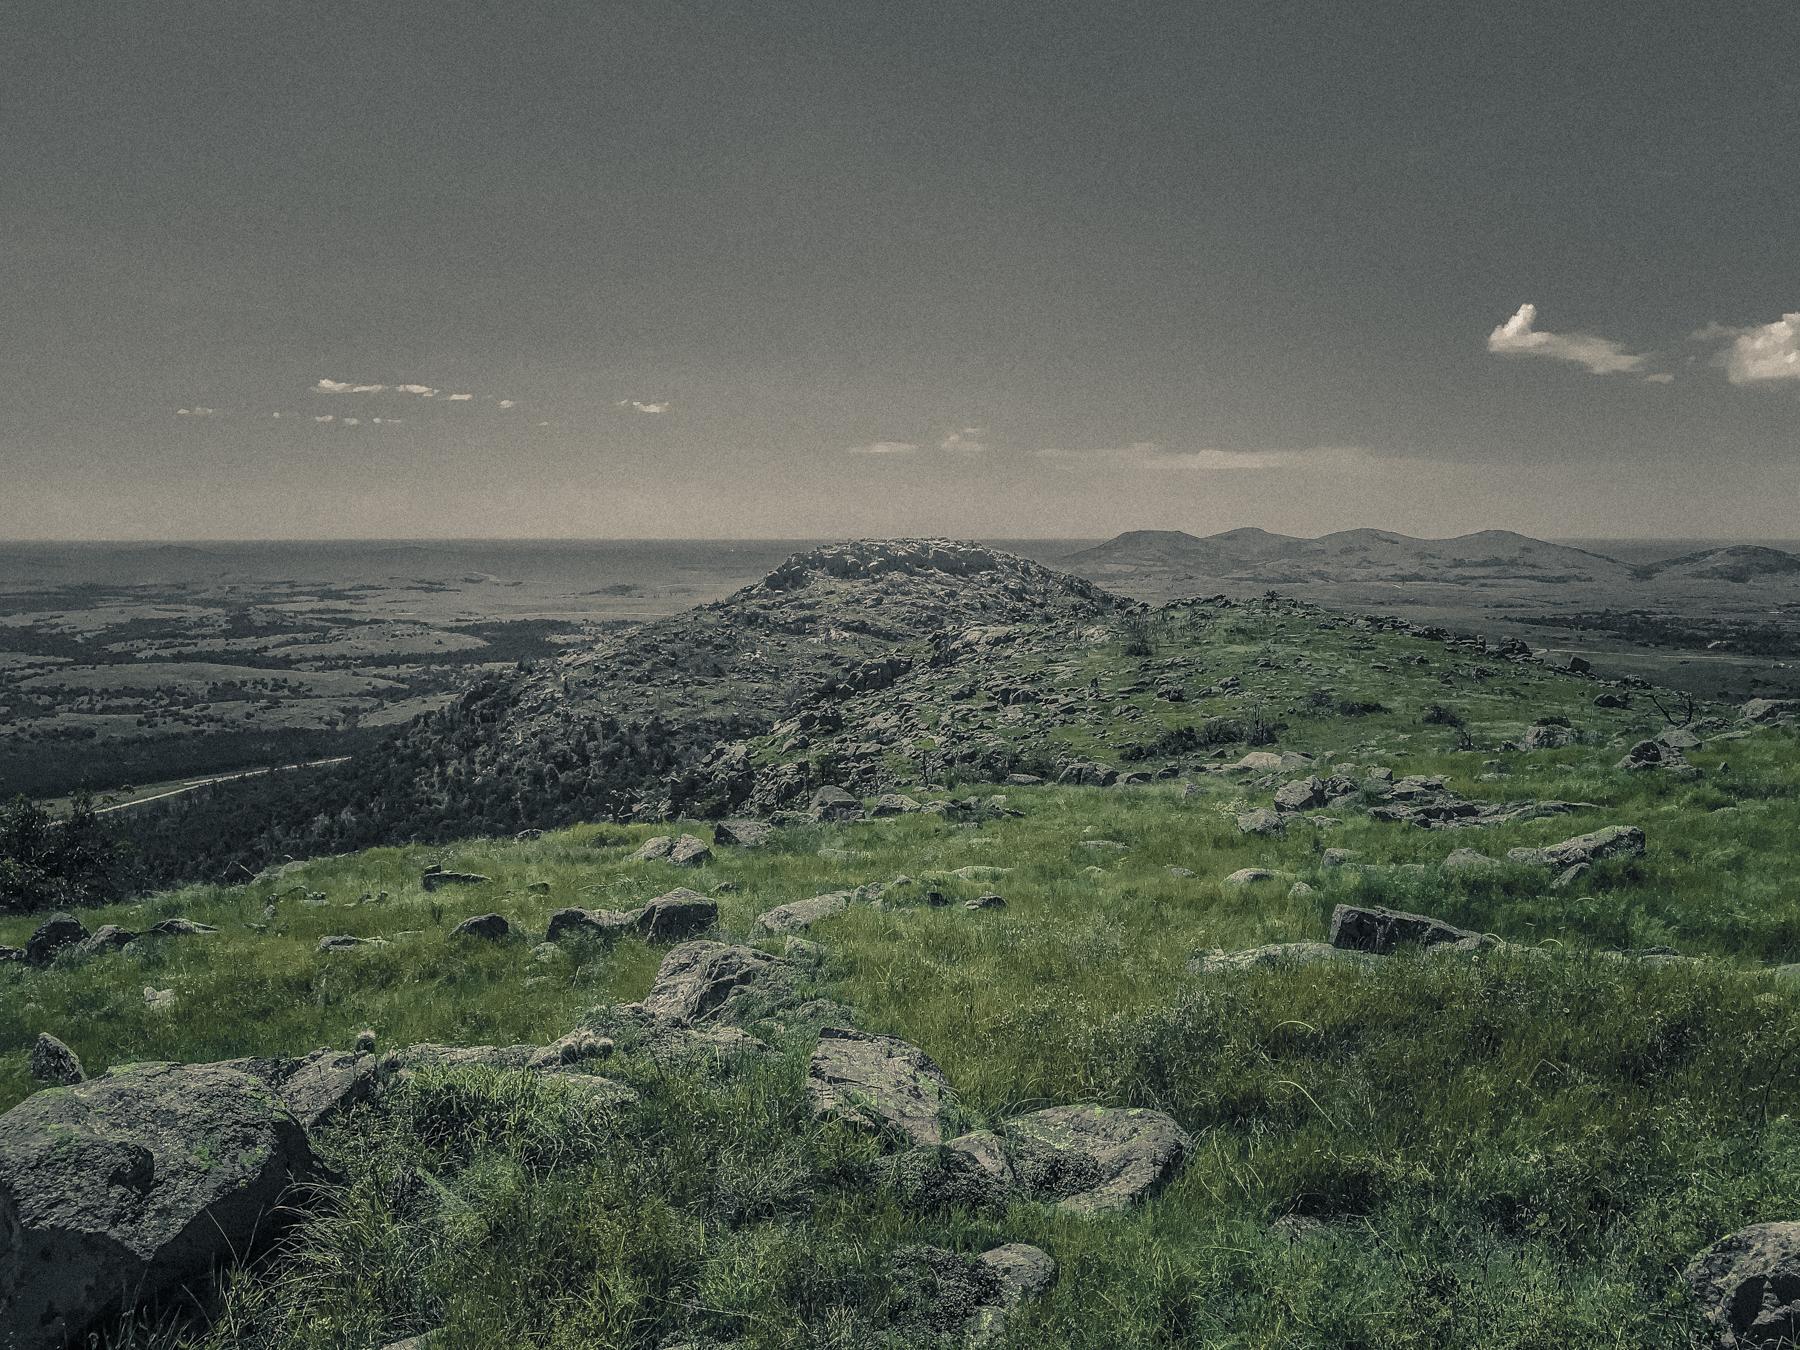 2017-08-21 Mount Sheridan ECLIPSE C (13 of 15).jpg